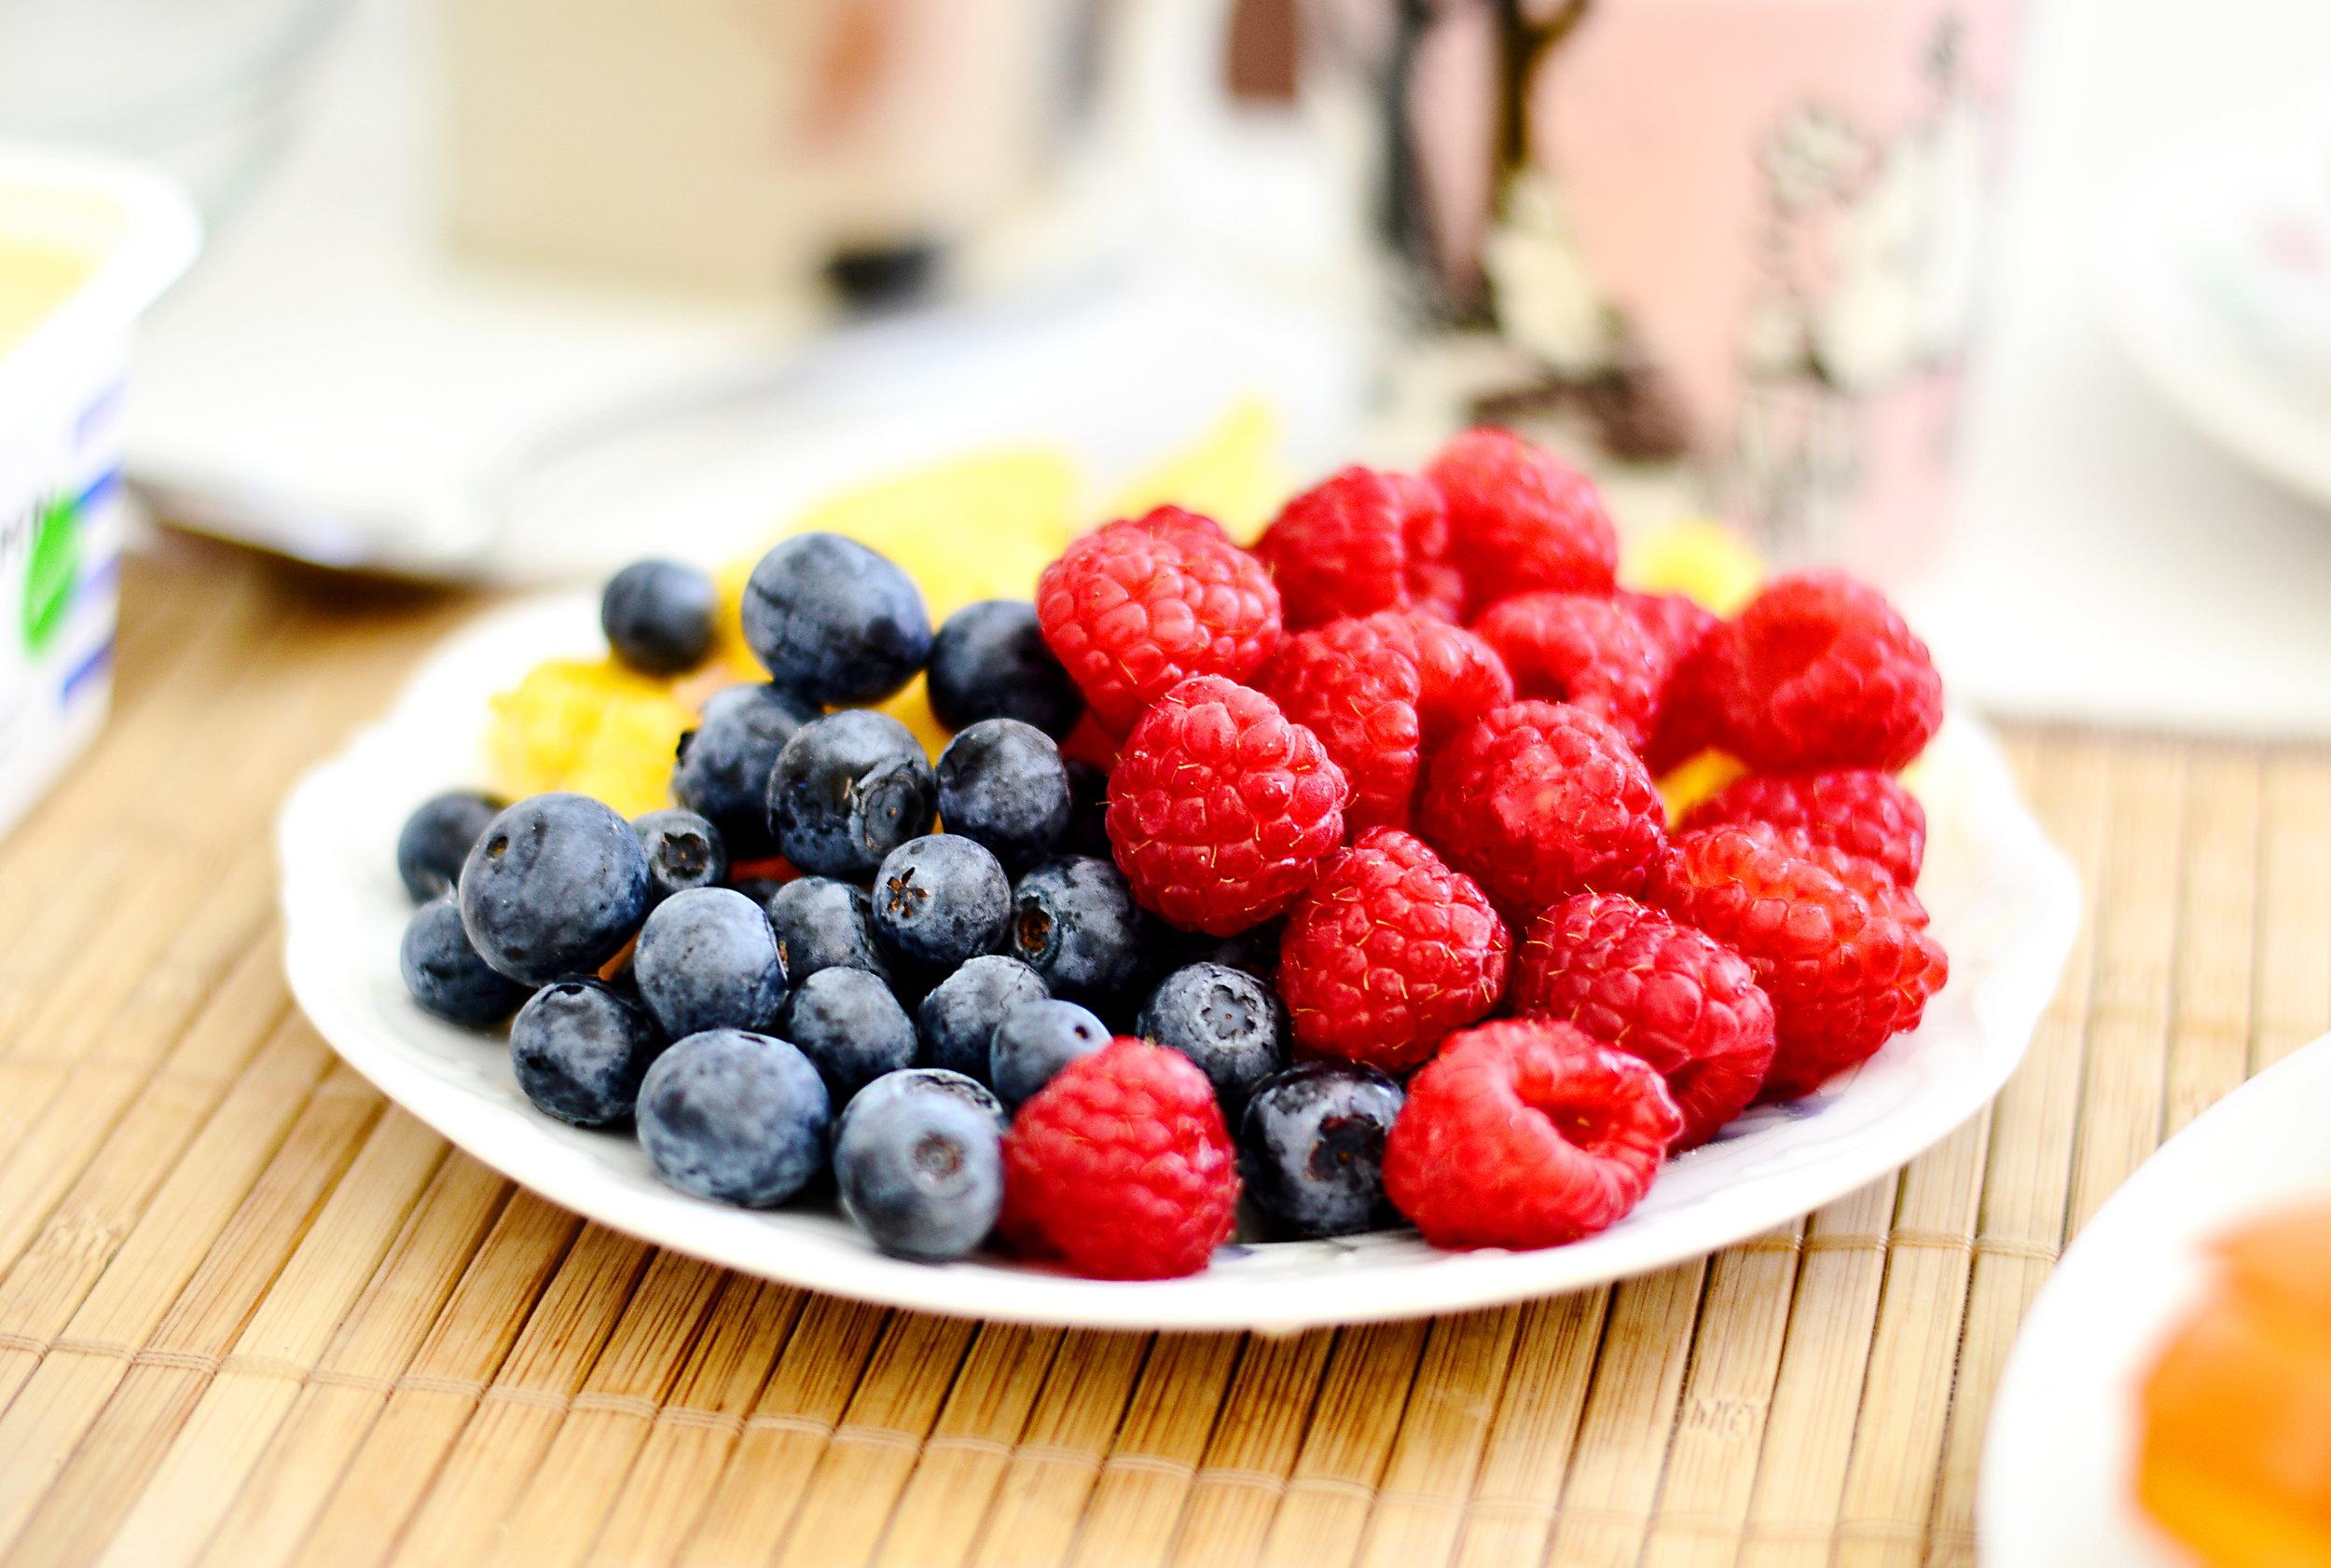 berriesonplate.jpeg